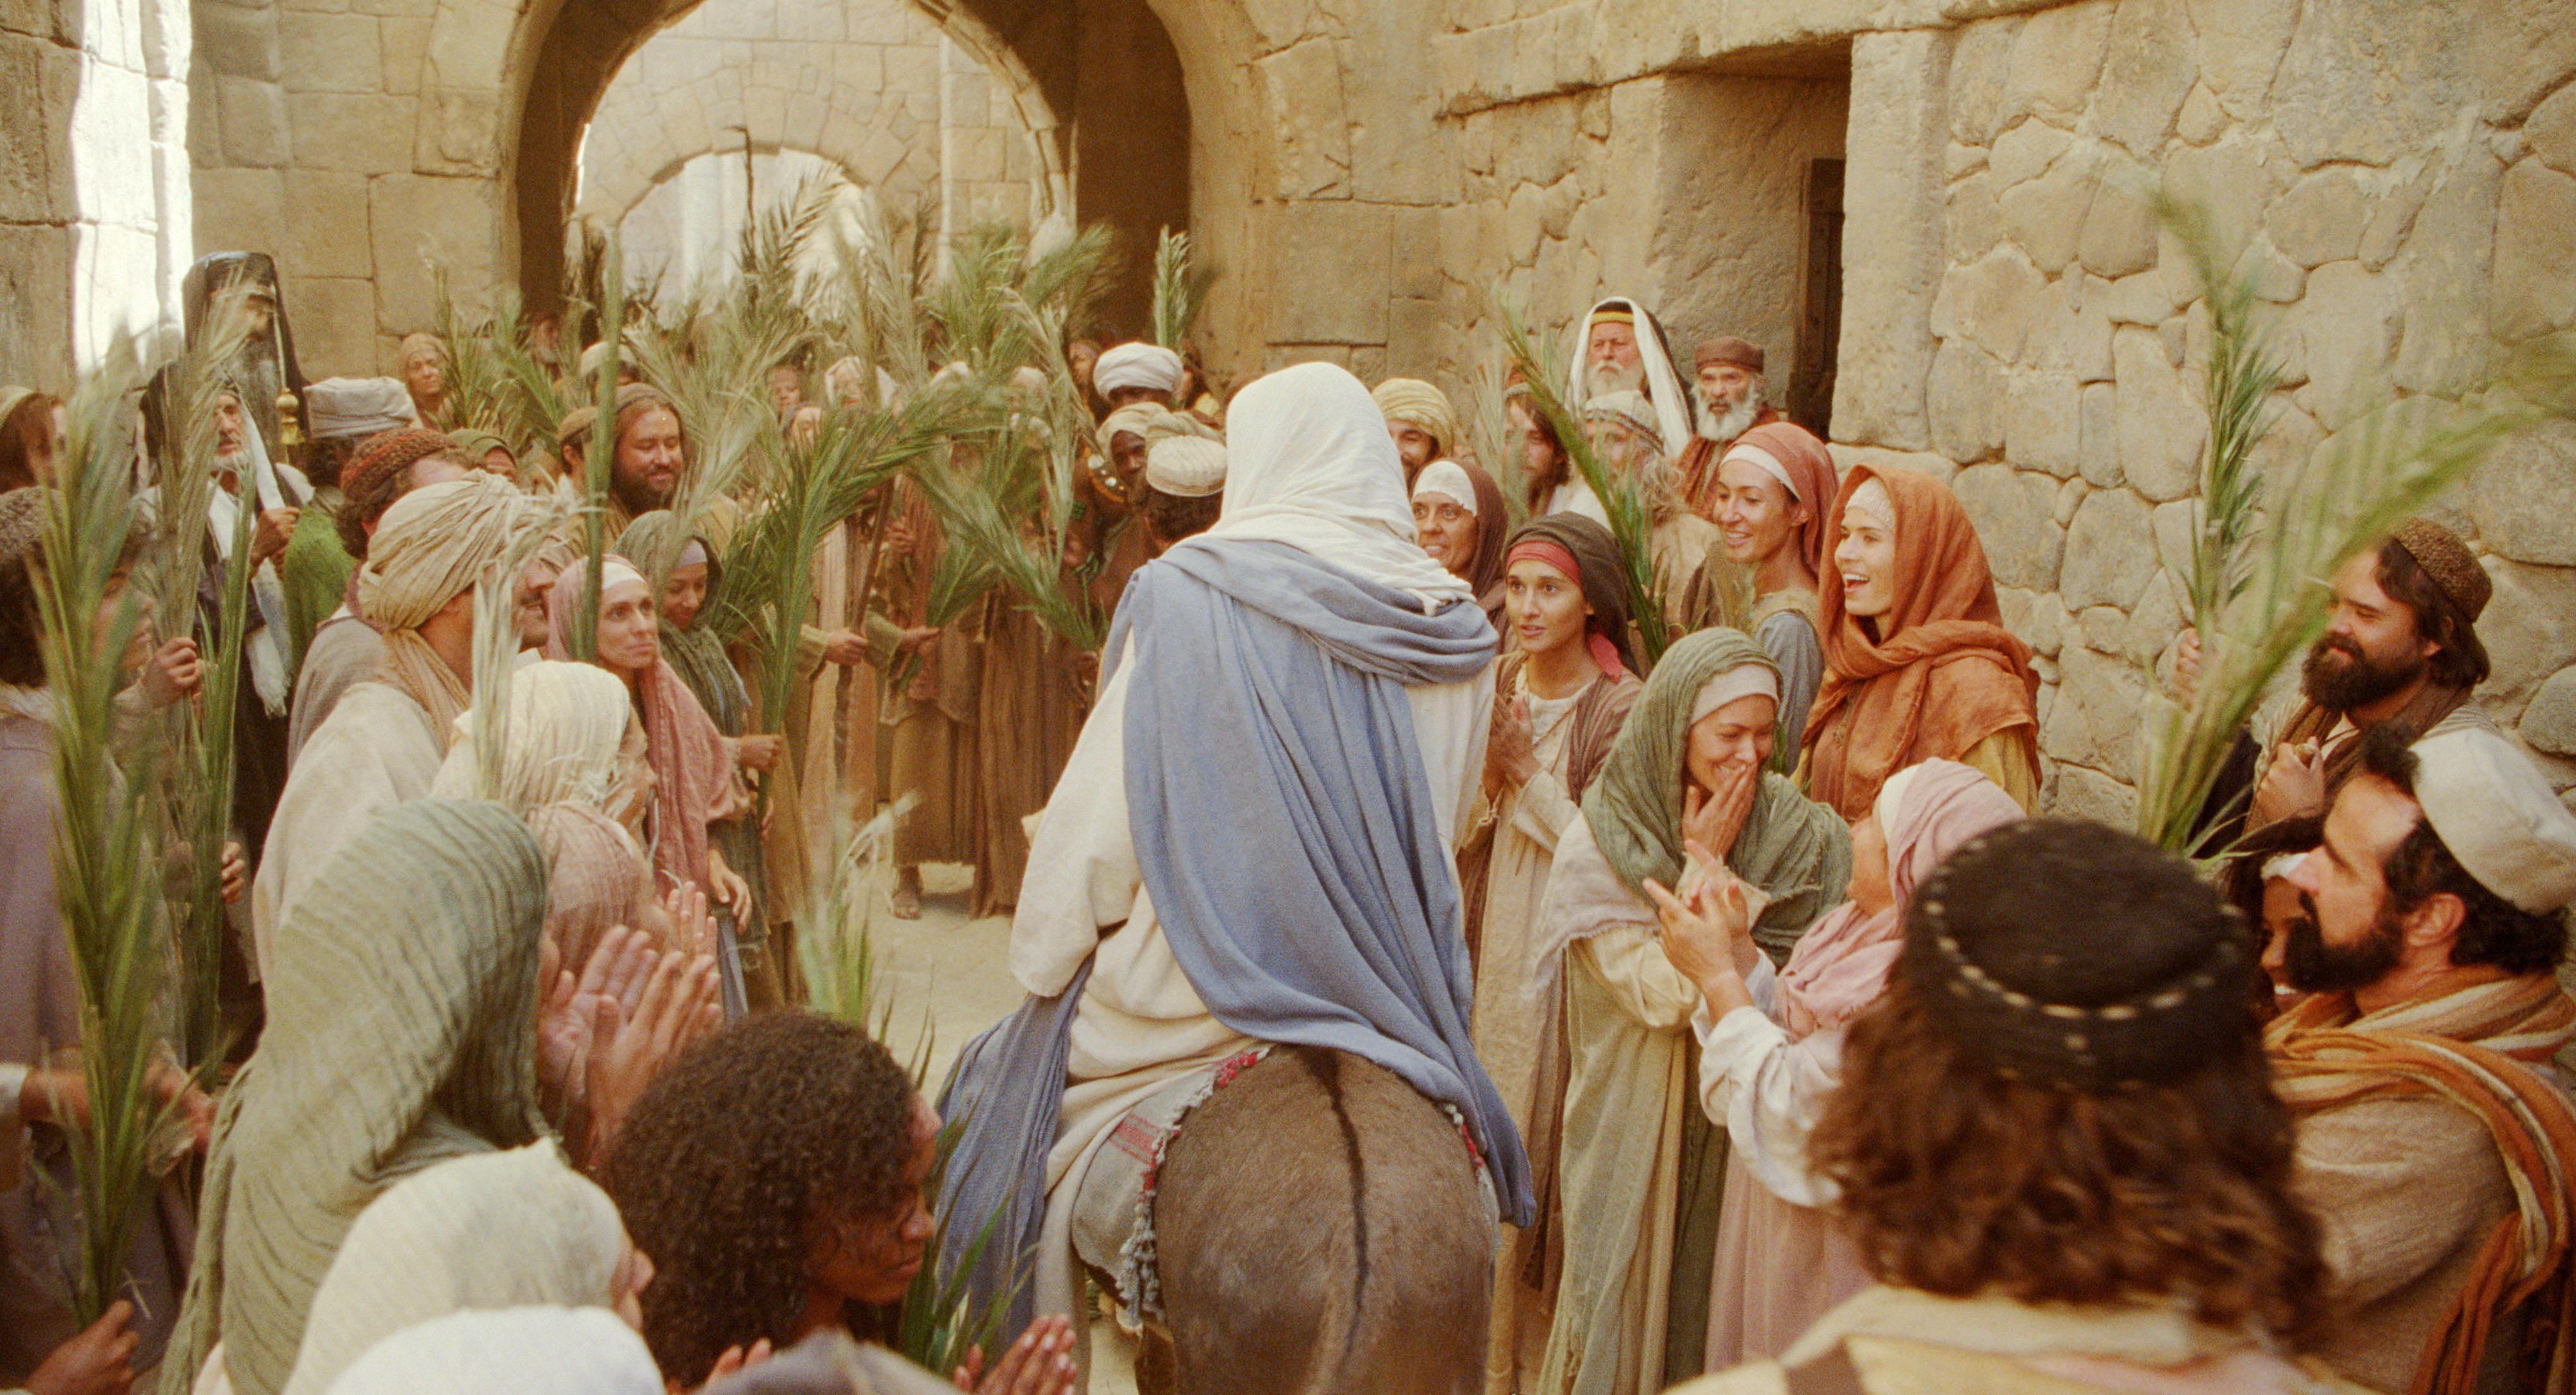 Jesus (finally) comes to Jerusalem as Messianic King